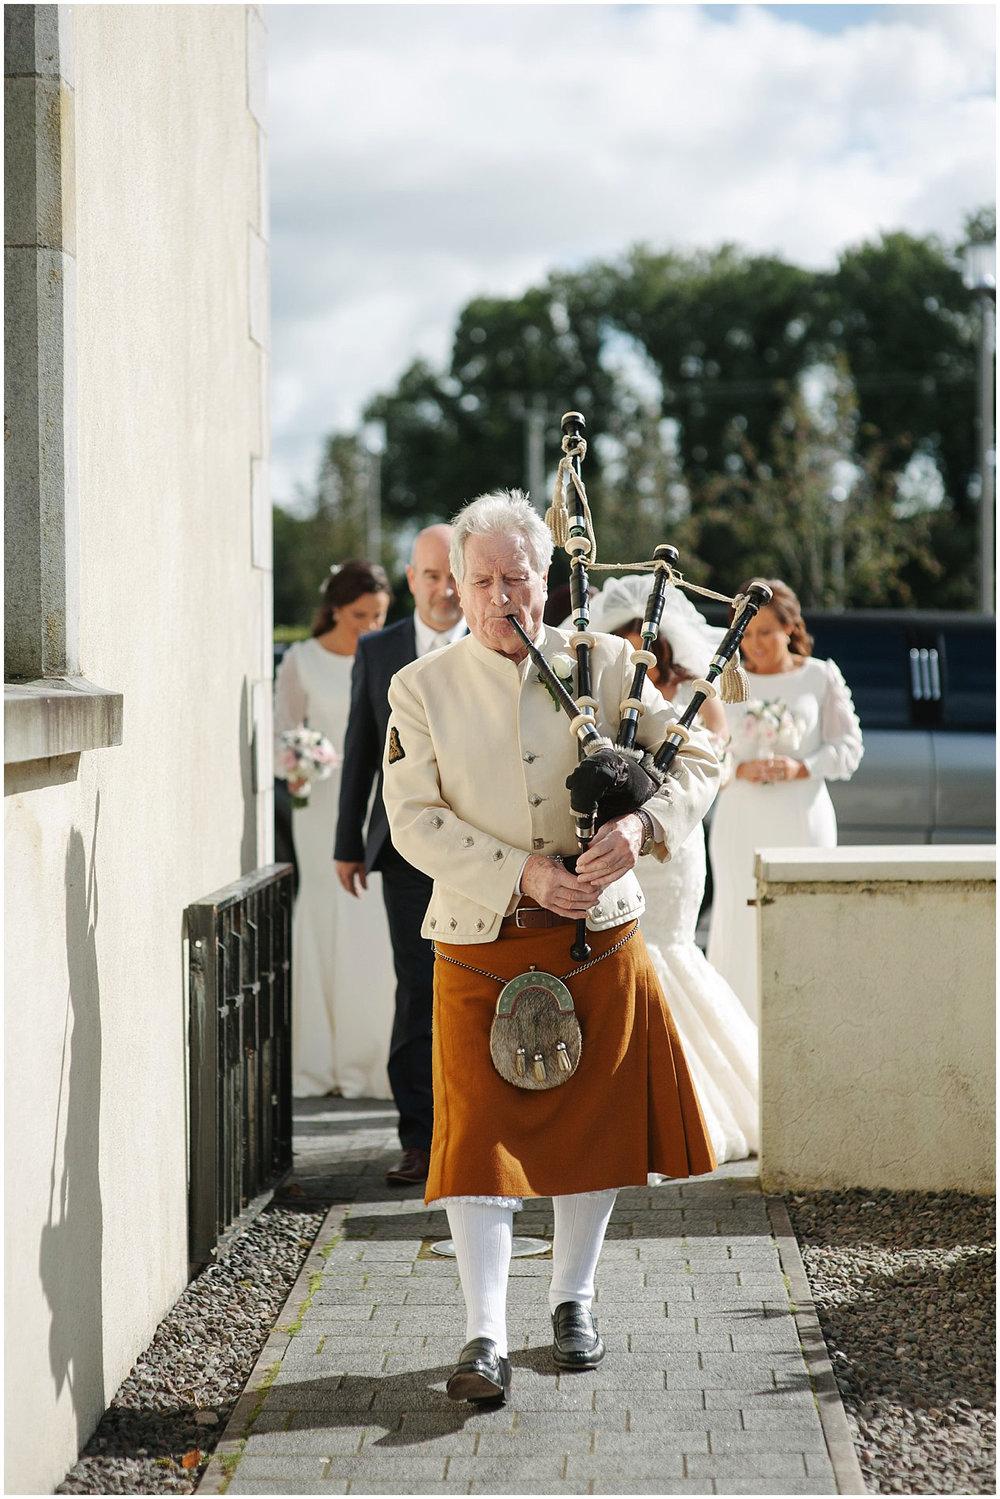 Shauneen_PJ_Hillgrove_Hotel_Monaghan_Wedding_jude_browne_photography_0029.jpg